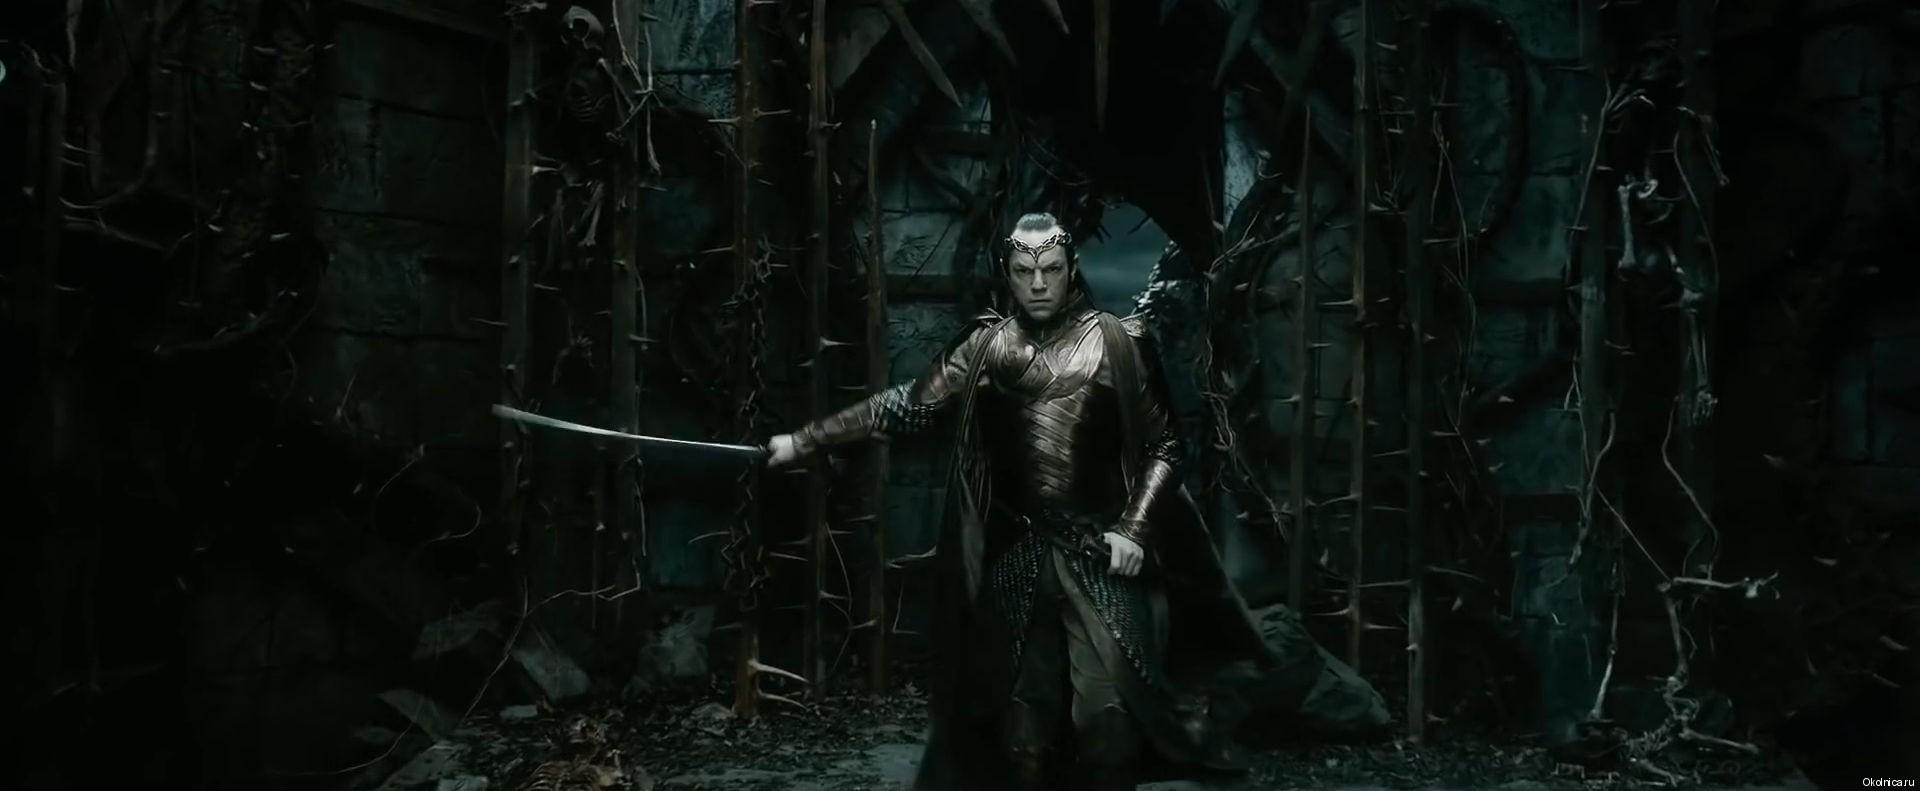 Kino_Hobbit_Bitva_pyati_voinstv_35